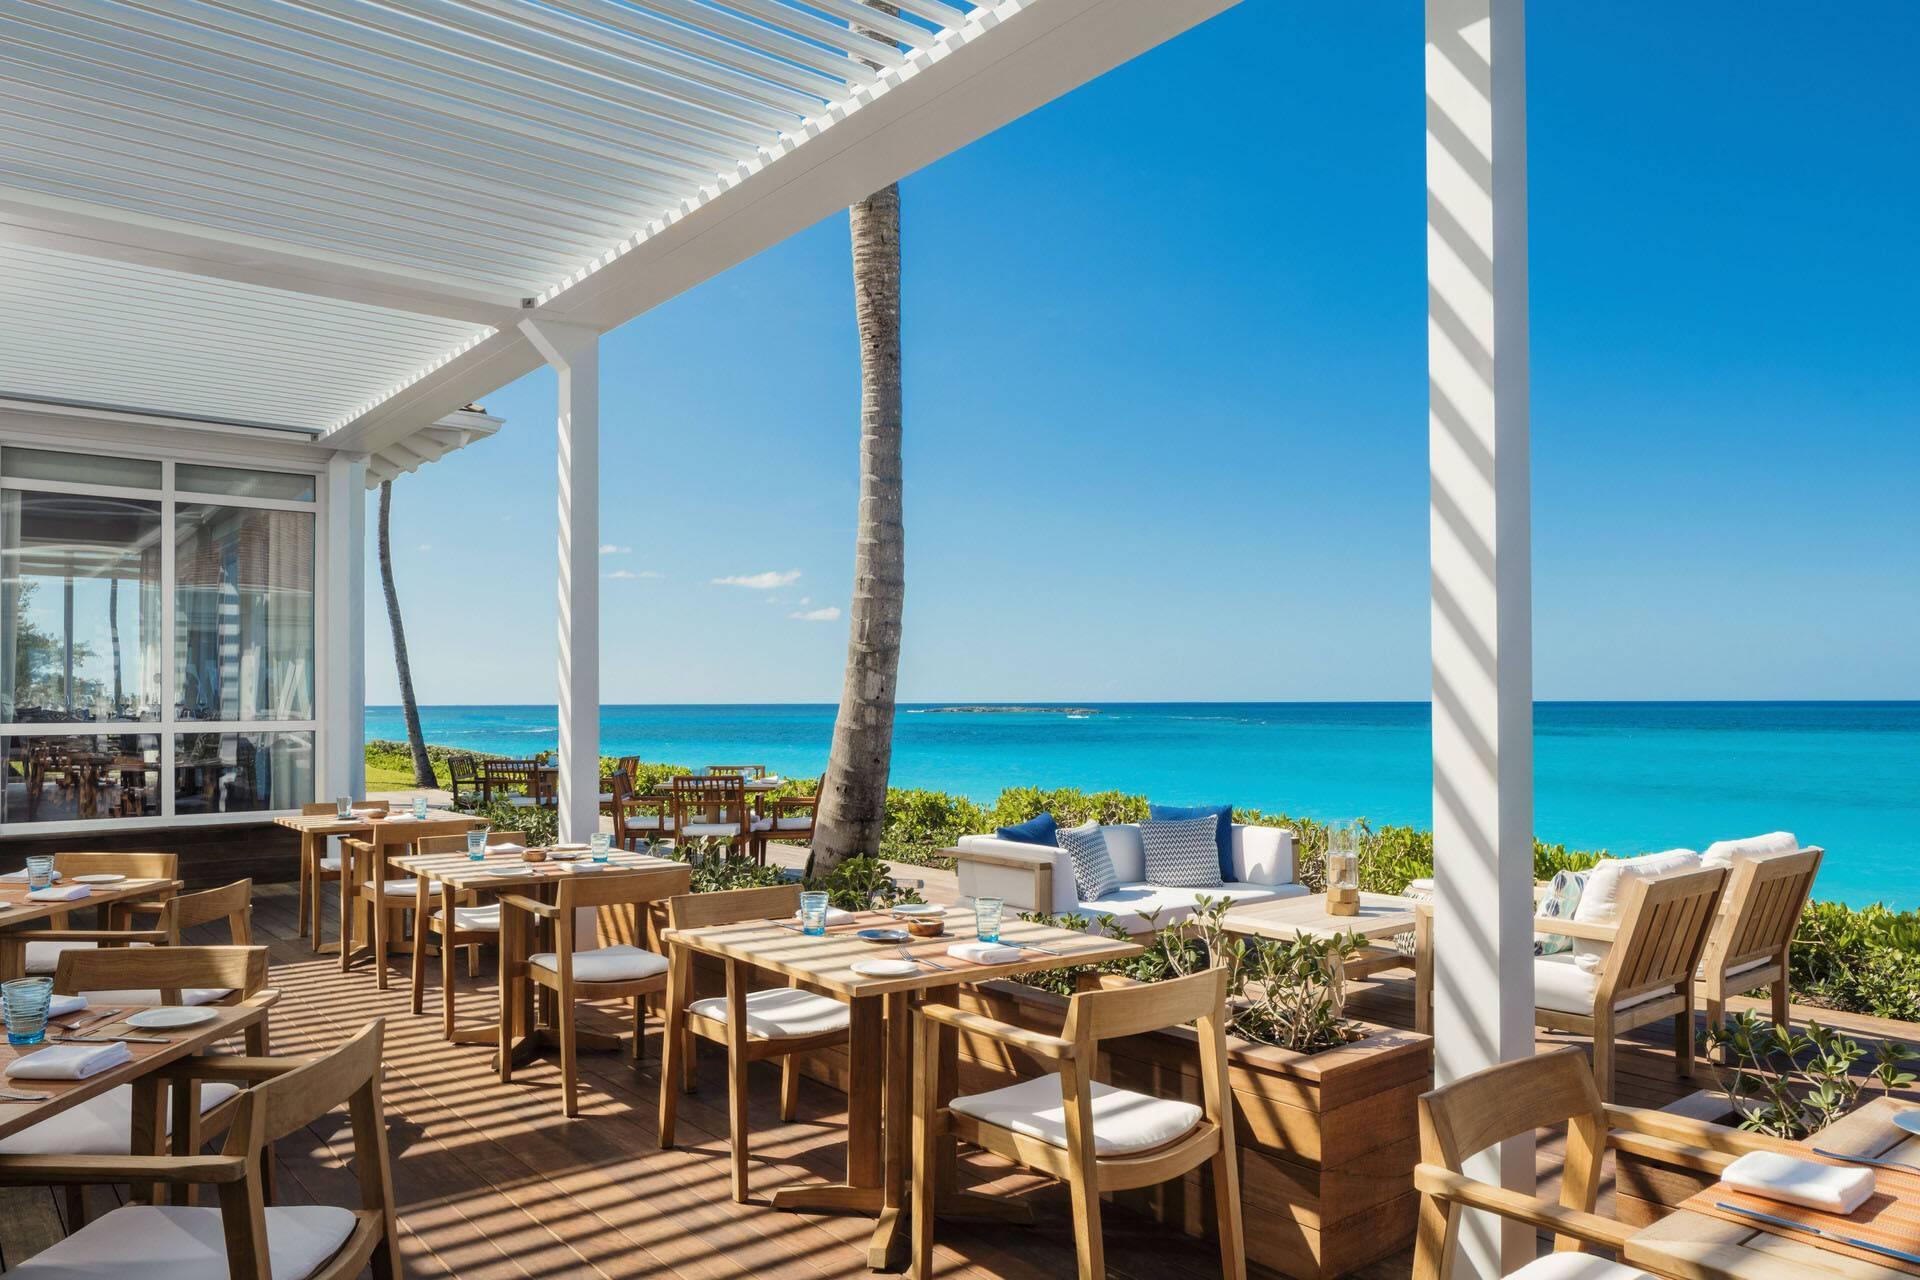 Ocean Club Four Seasons Bahamas Restaurant Dune Terrasse